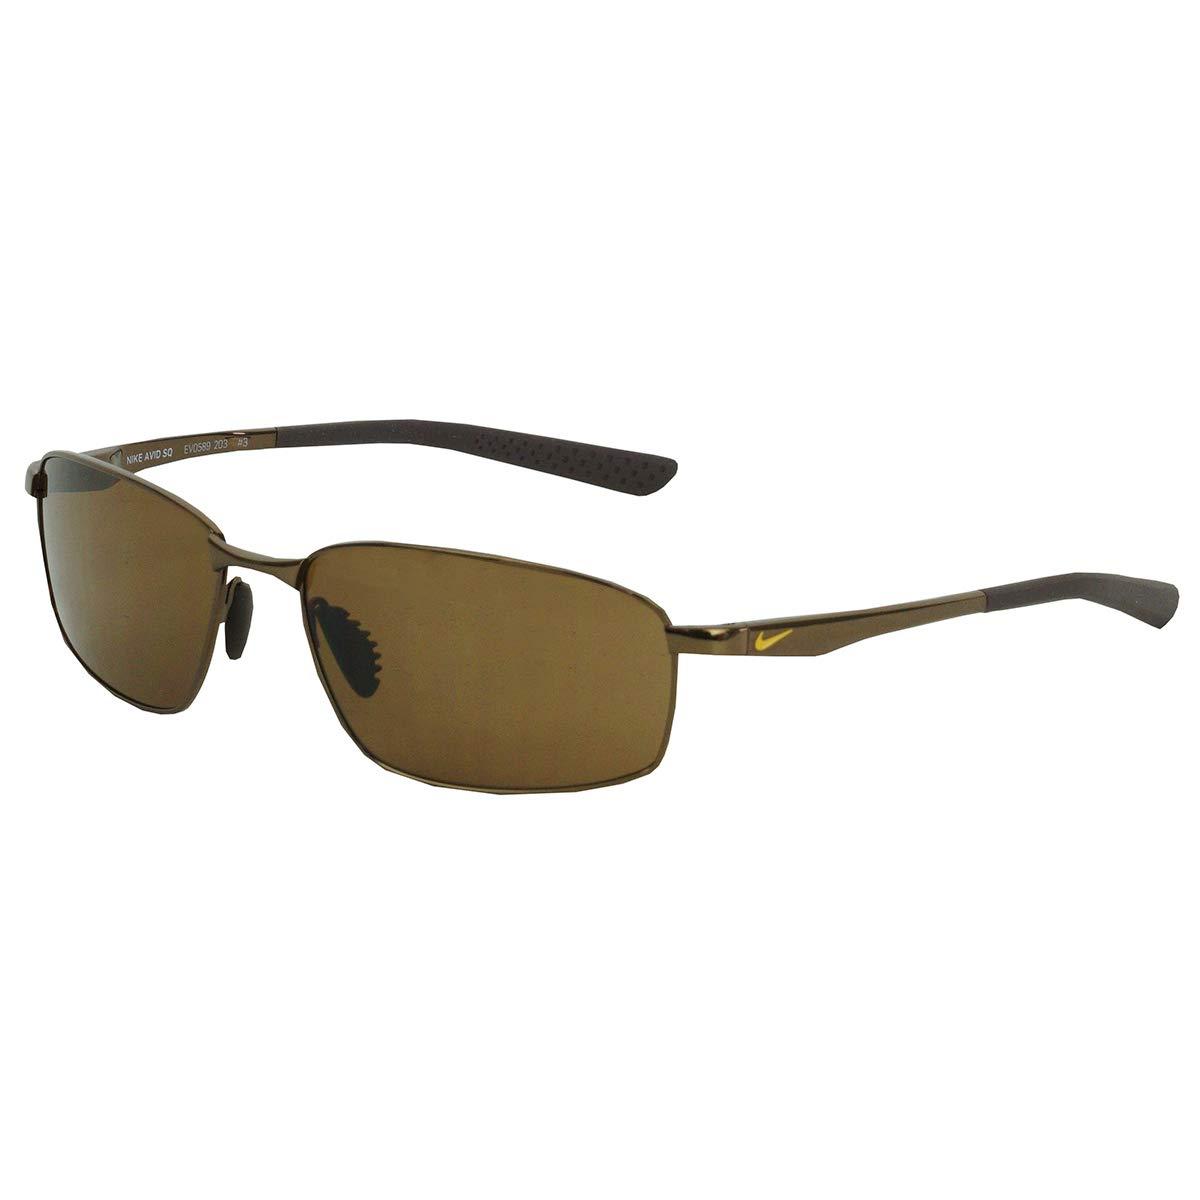 Nike Avid SQ Sunglasses (Walnut Frame, Brown Lens)